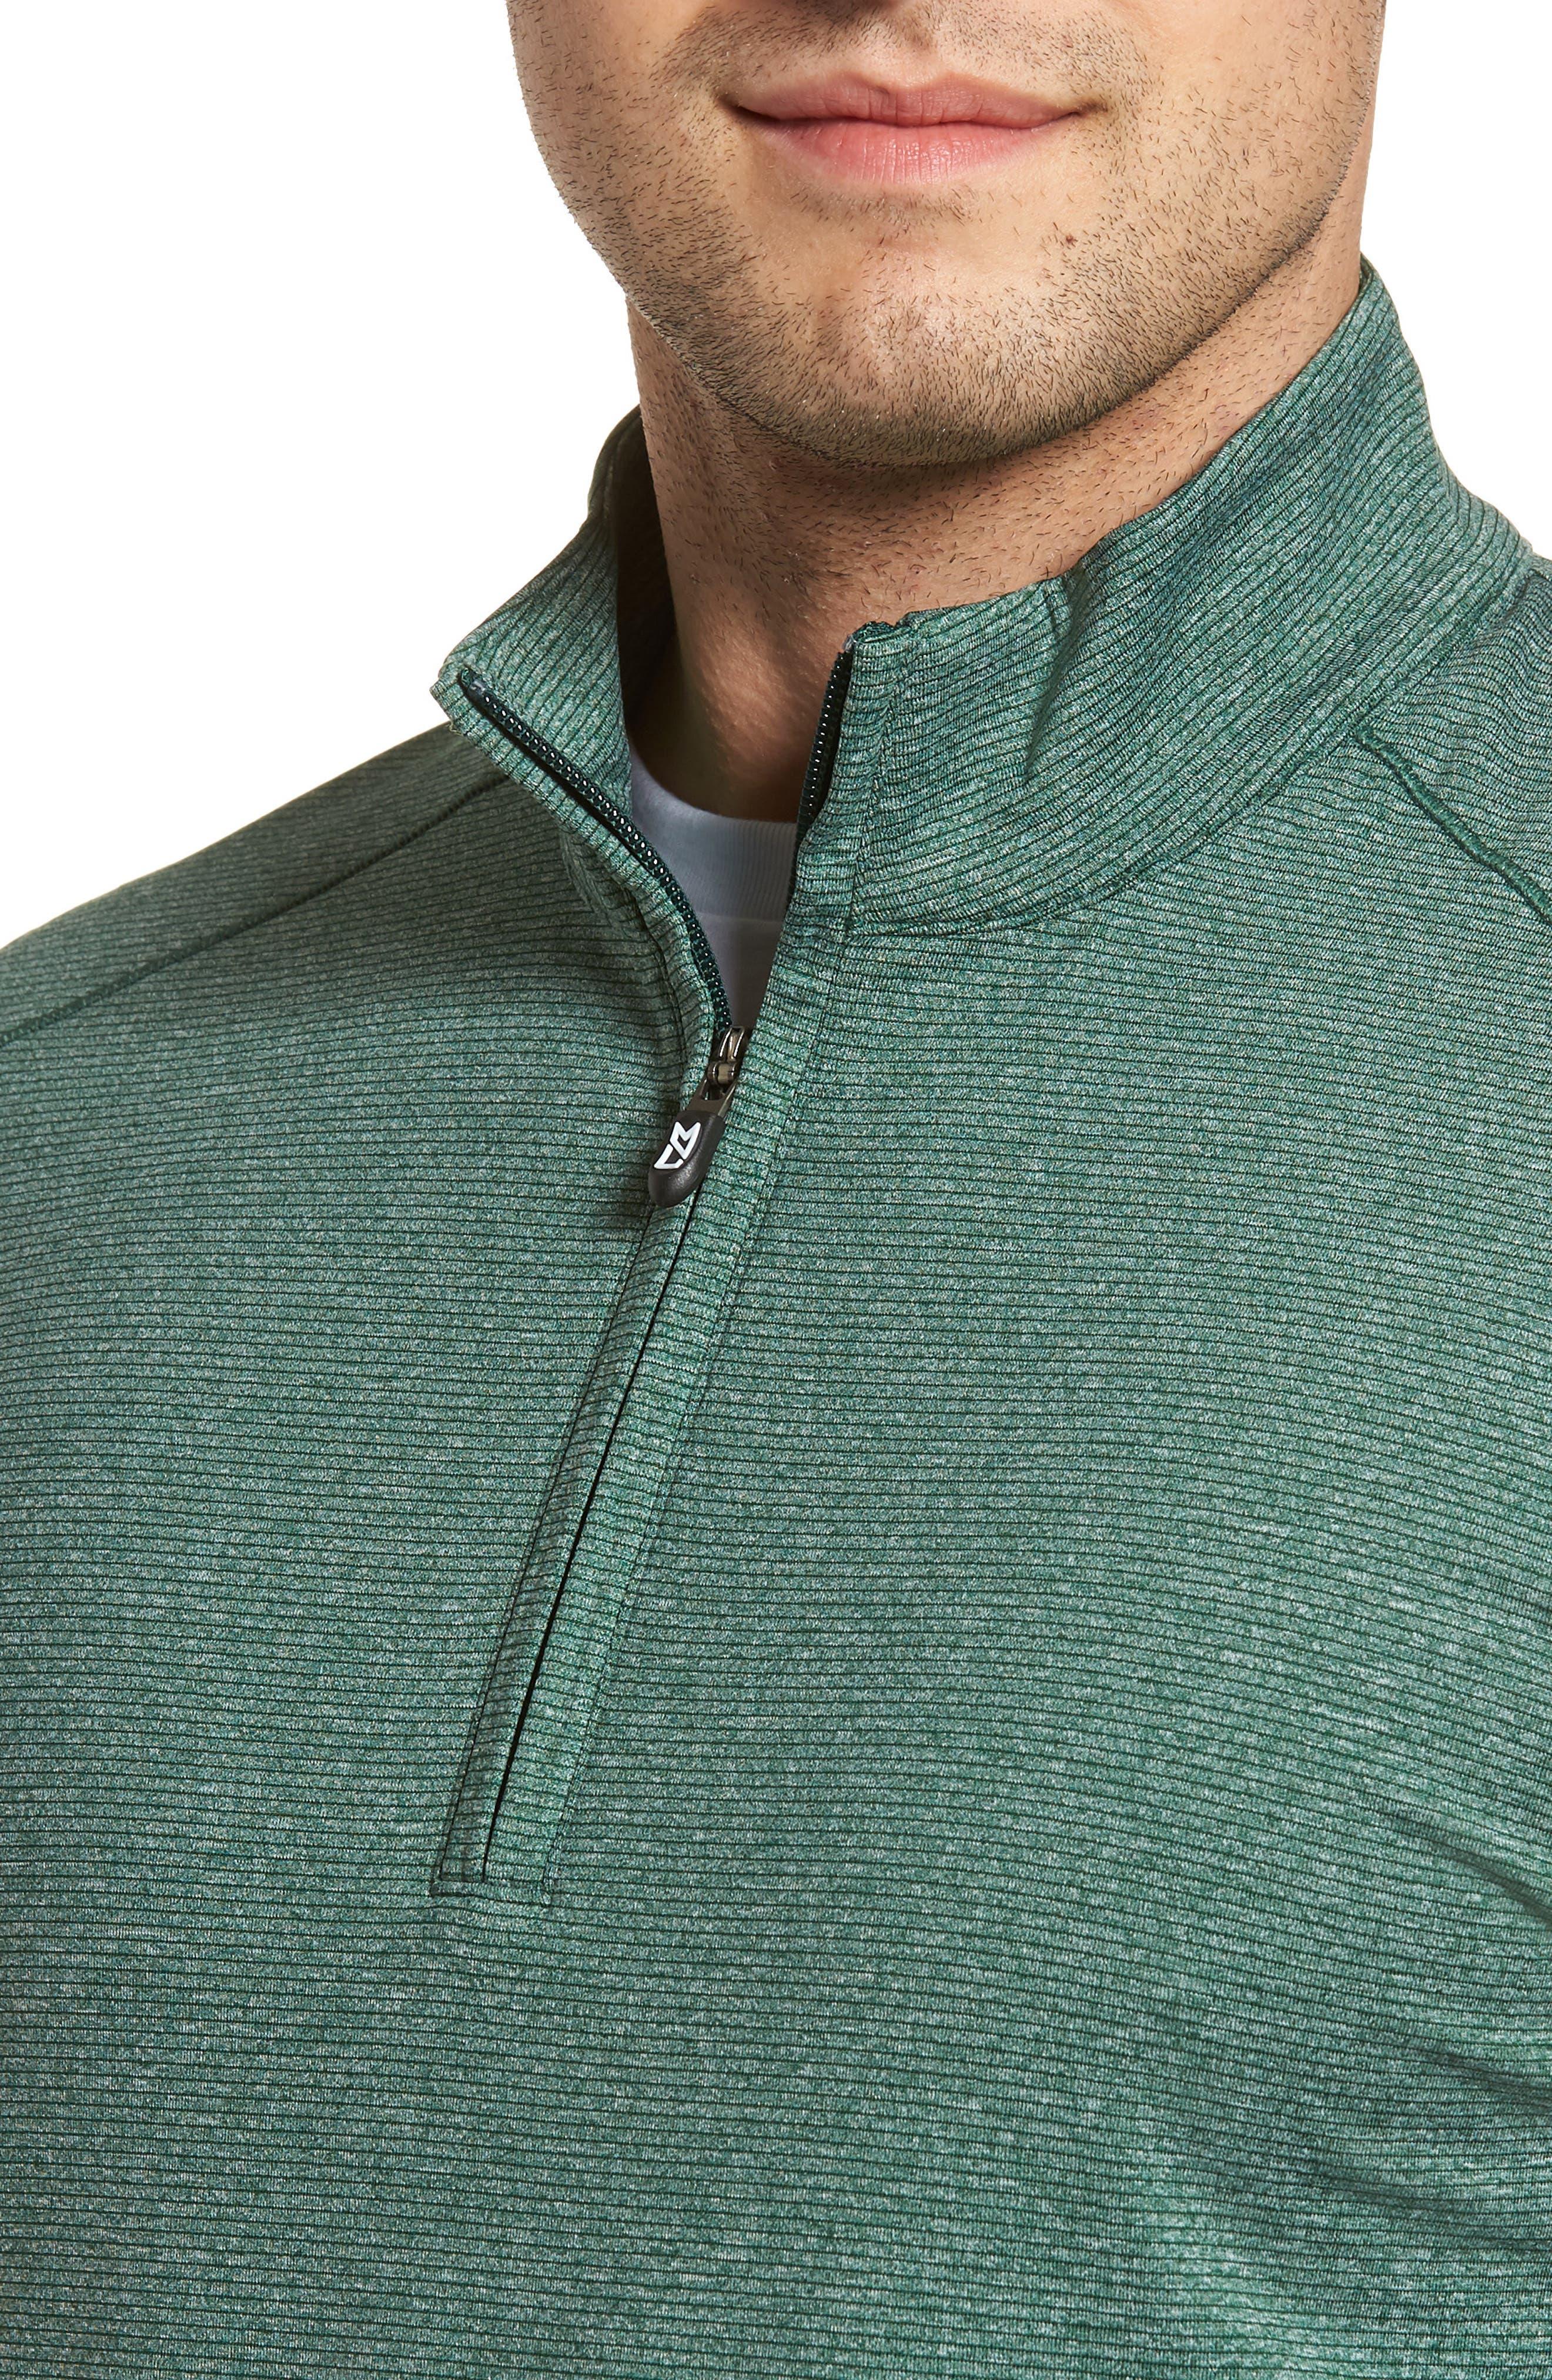 Shoreline Classic Fit Half Zip Pullover,                             Alternate thumbnail 4, color,                             HUNTER HEATHER